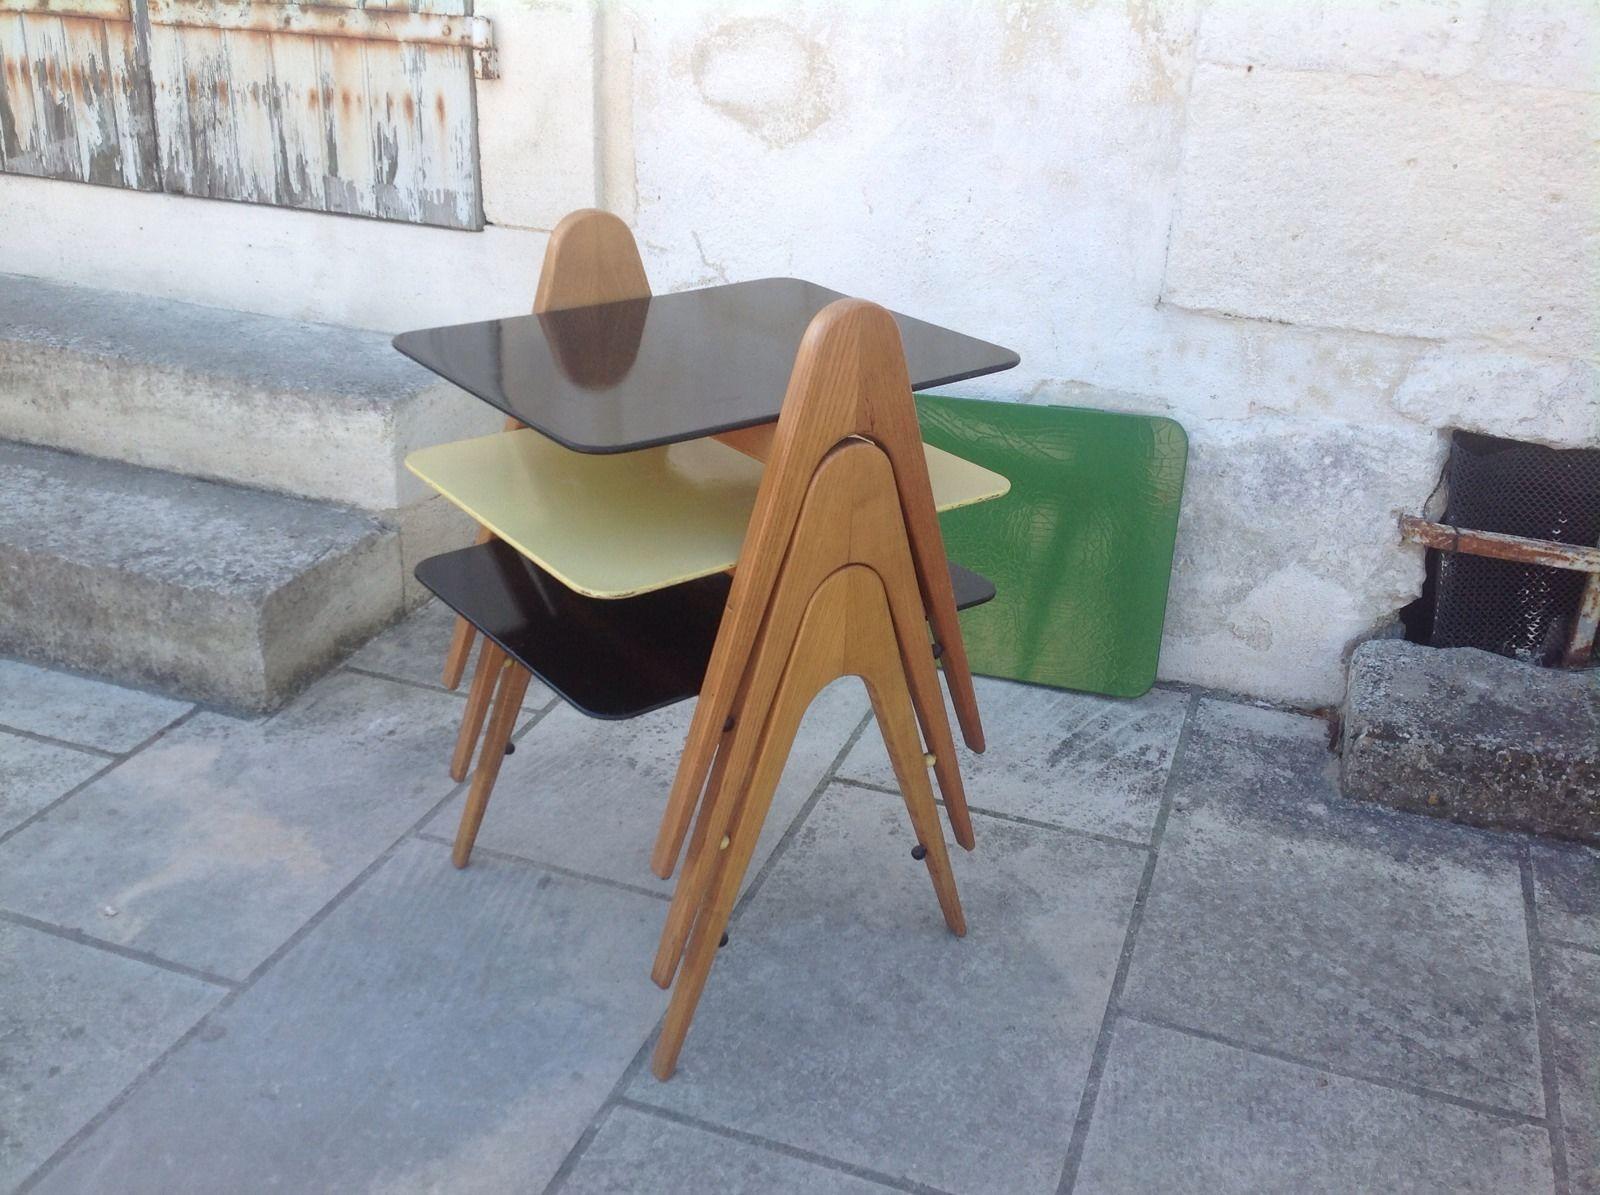 Table basse gigogne design 50 60 scandinave charlotte perriand prouv vintage ebay meubles - Salle de bain charlotte perriand ...